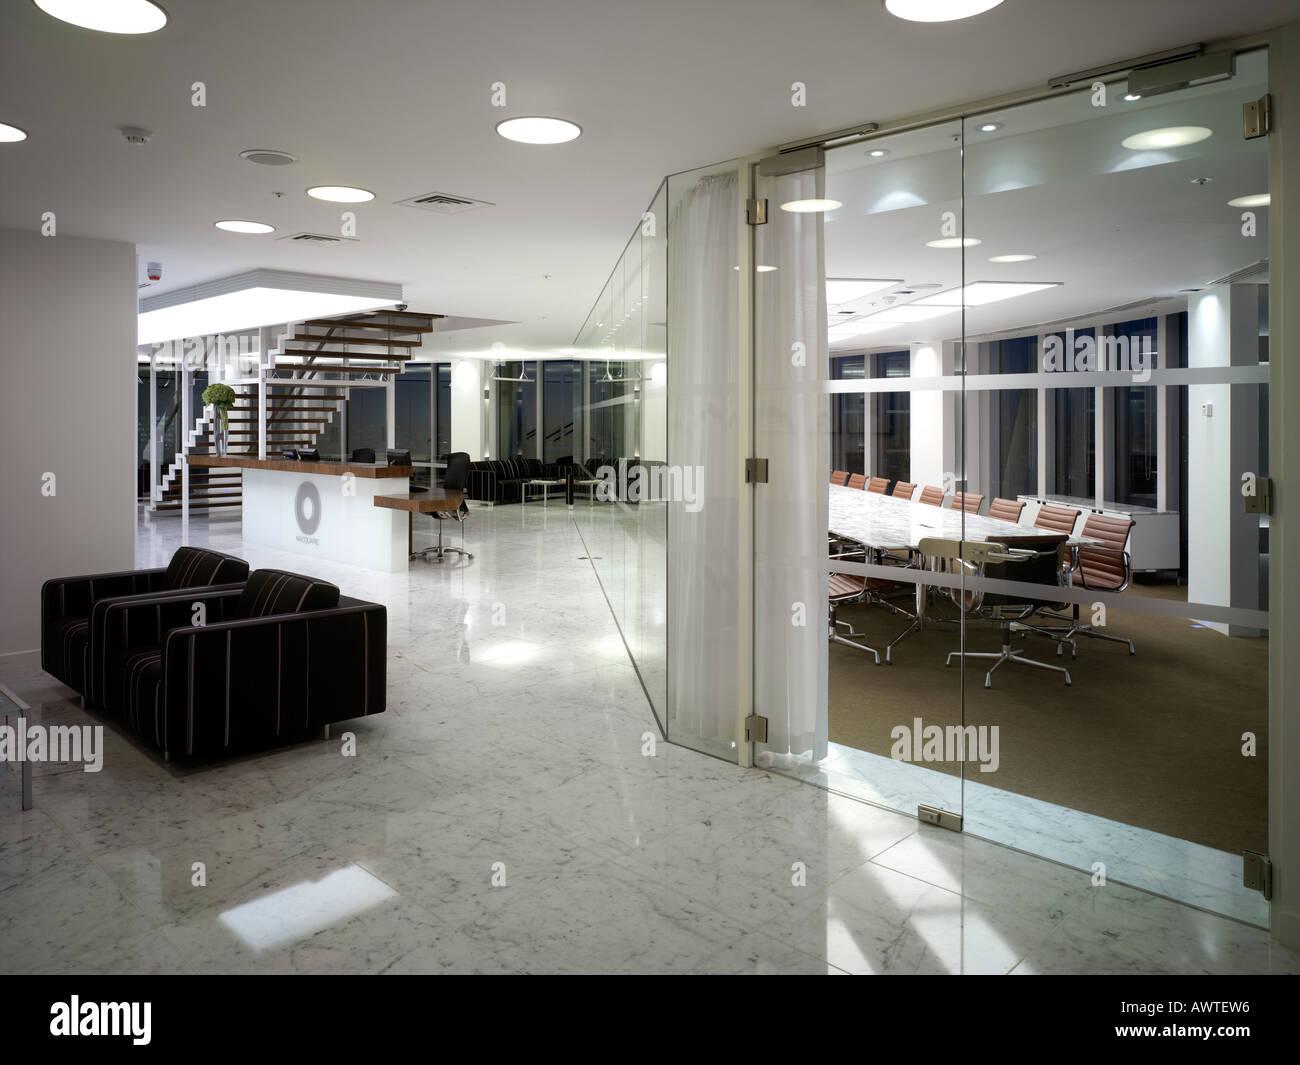 macquarie london office. CITY POINT-MACQUARIE BANK, LONDON, UK Macquarie London Office